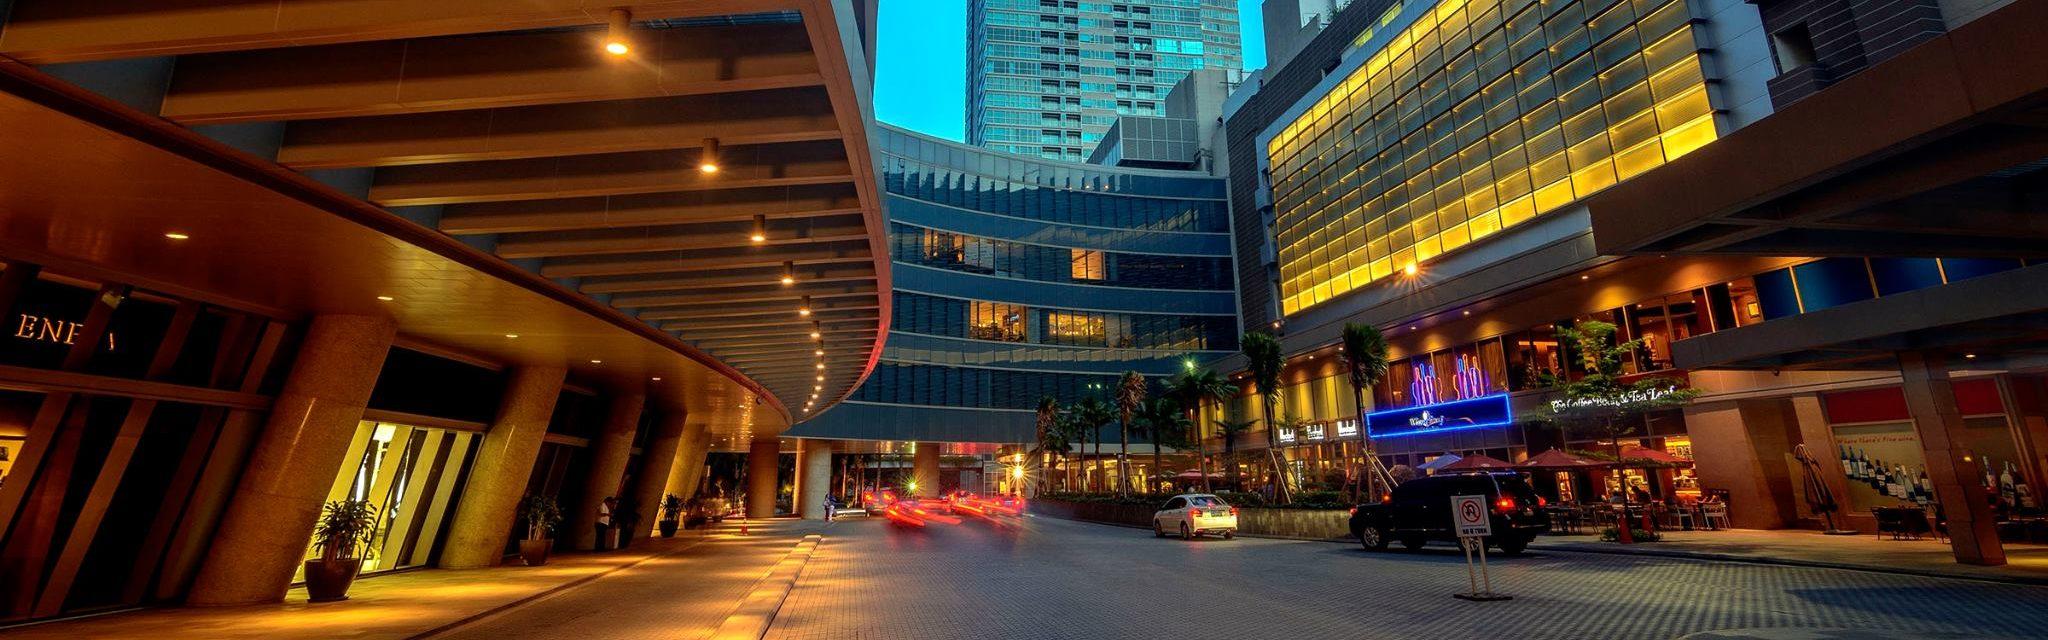 Shangri-La Plaza Exterior Facade